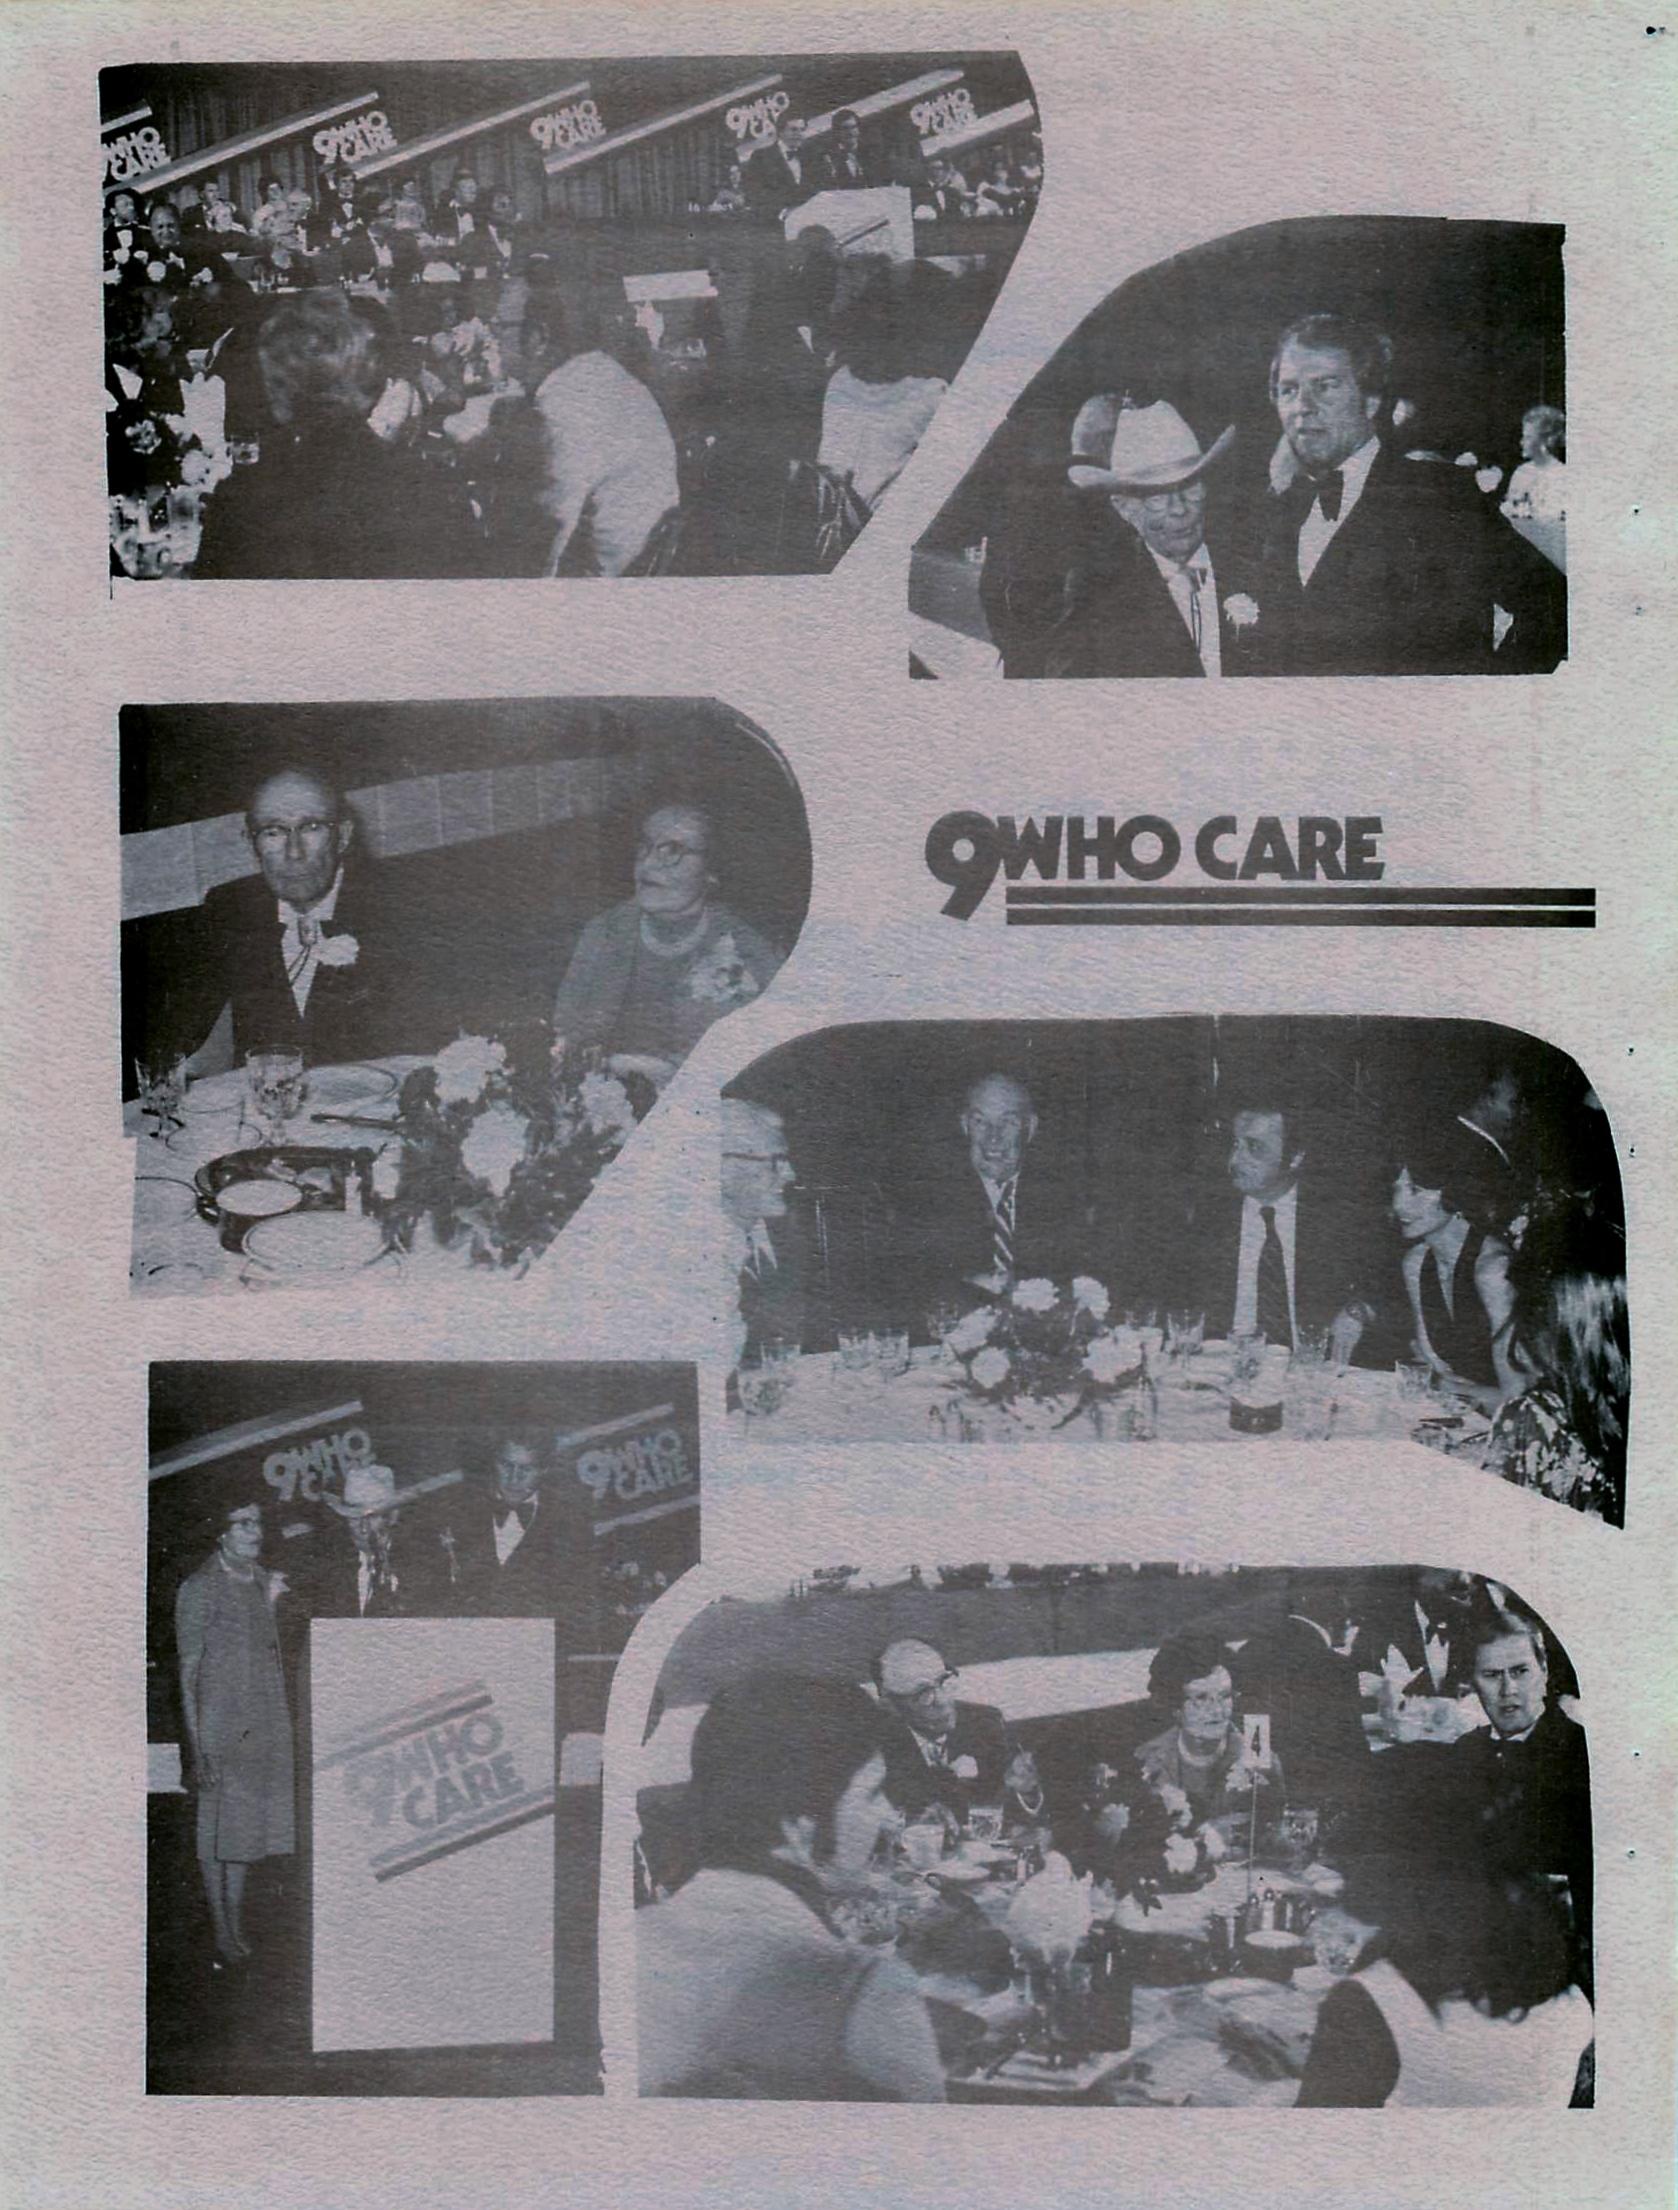 9 Who Care Award 1979_Page_12.jpg